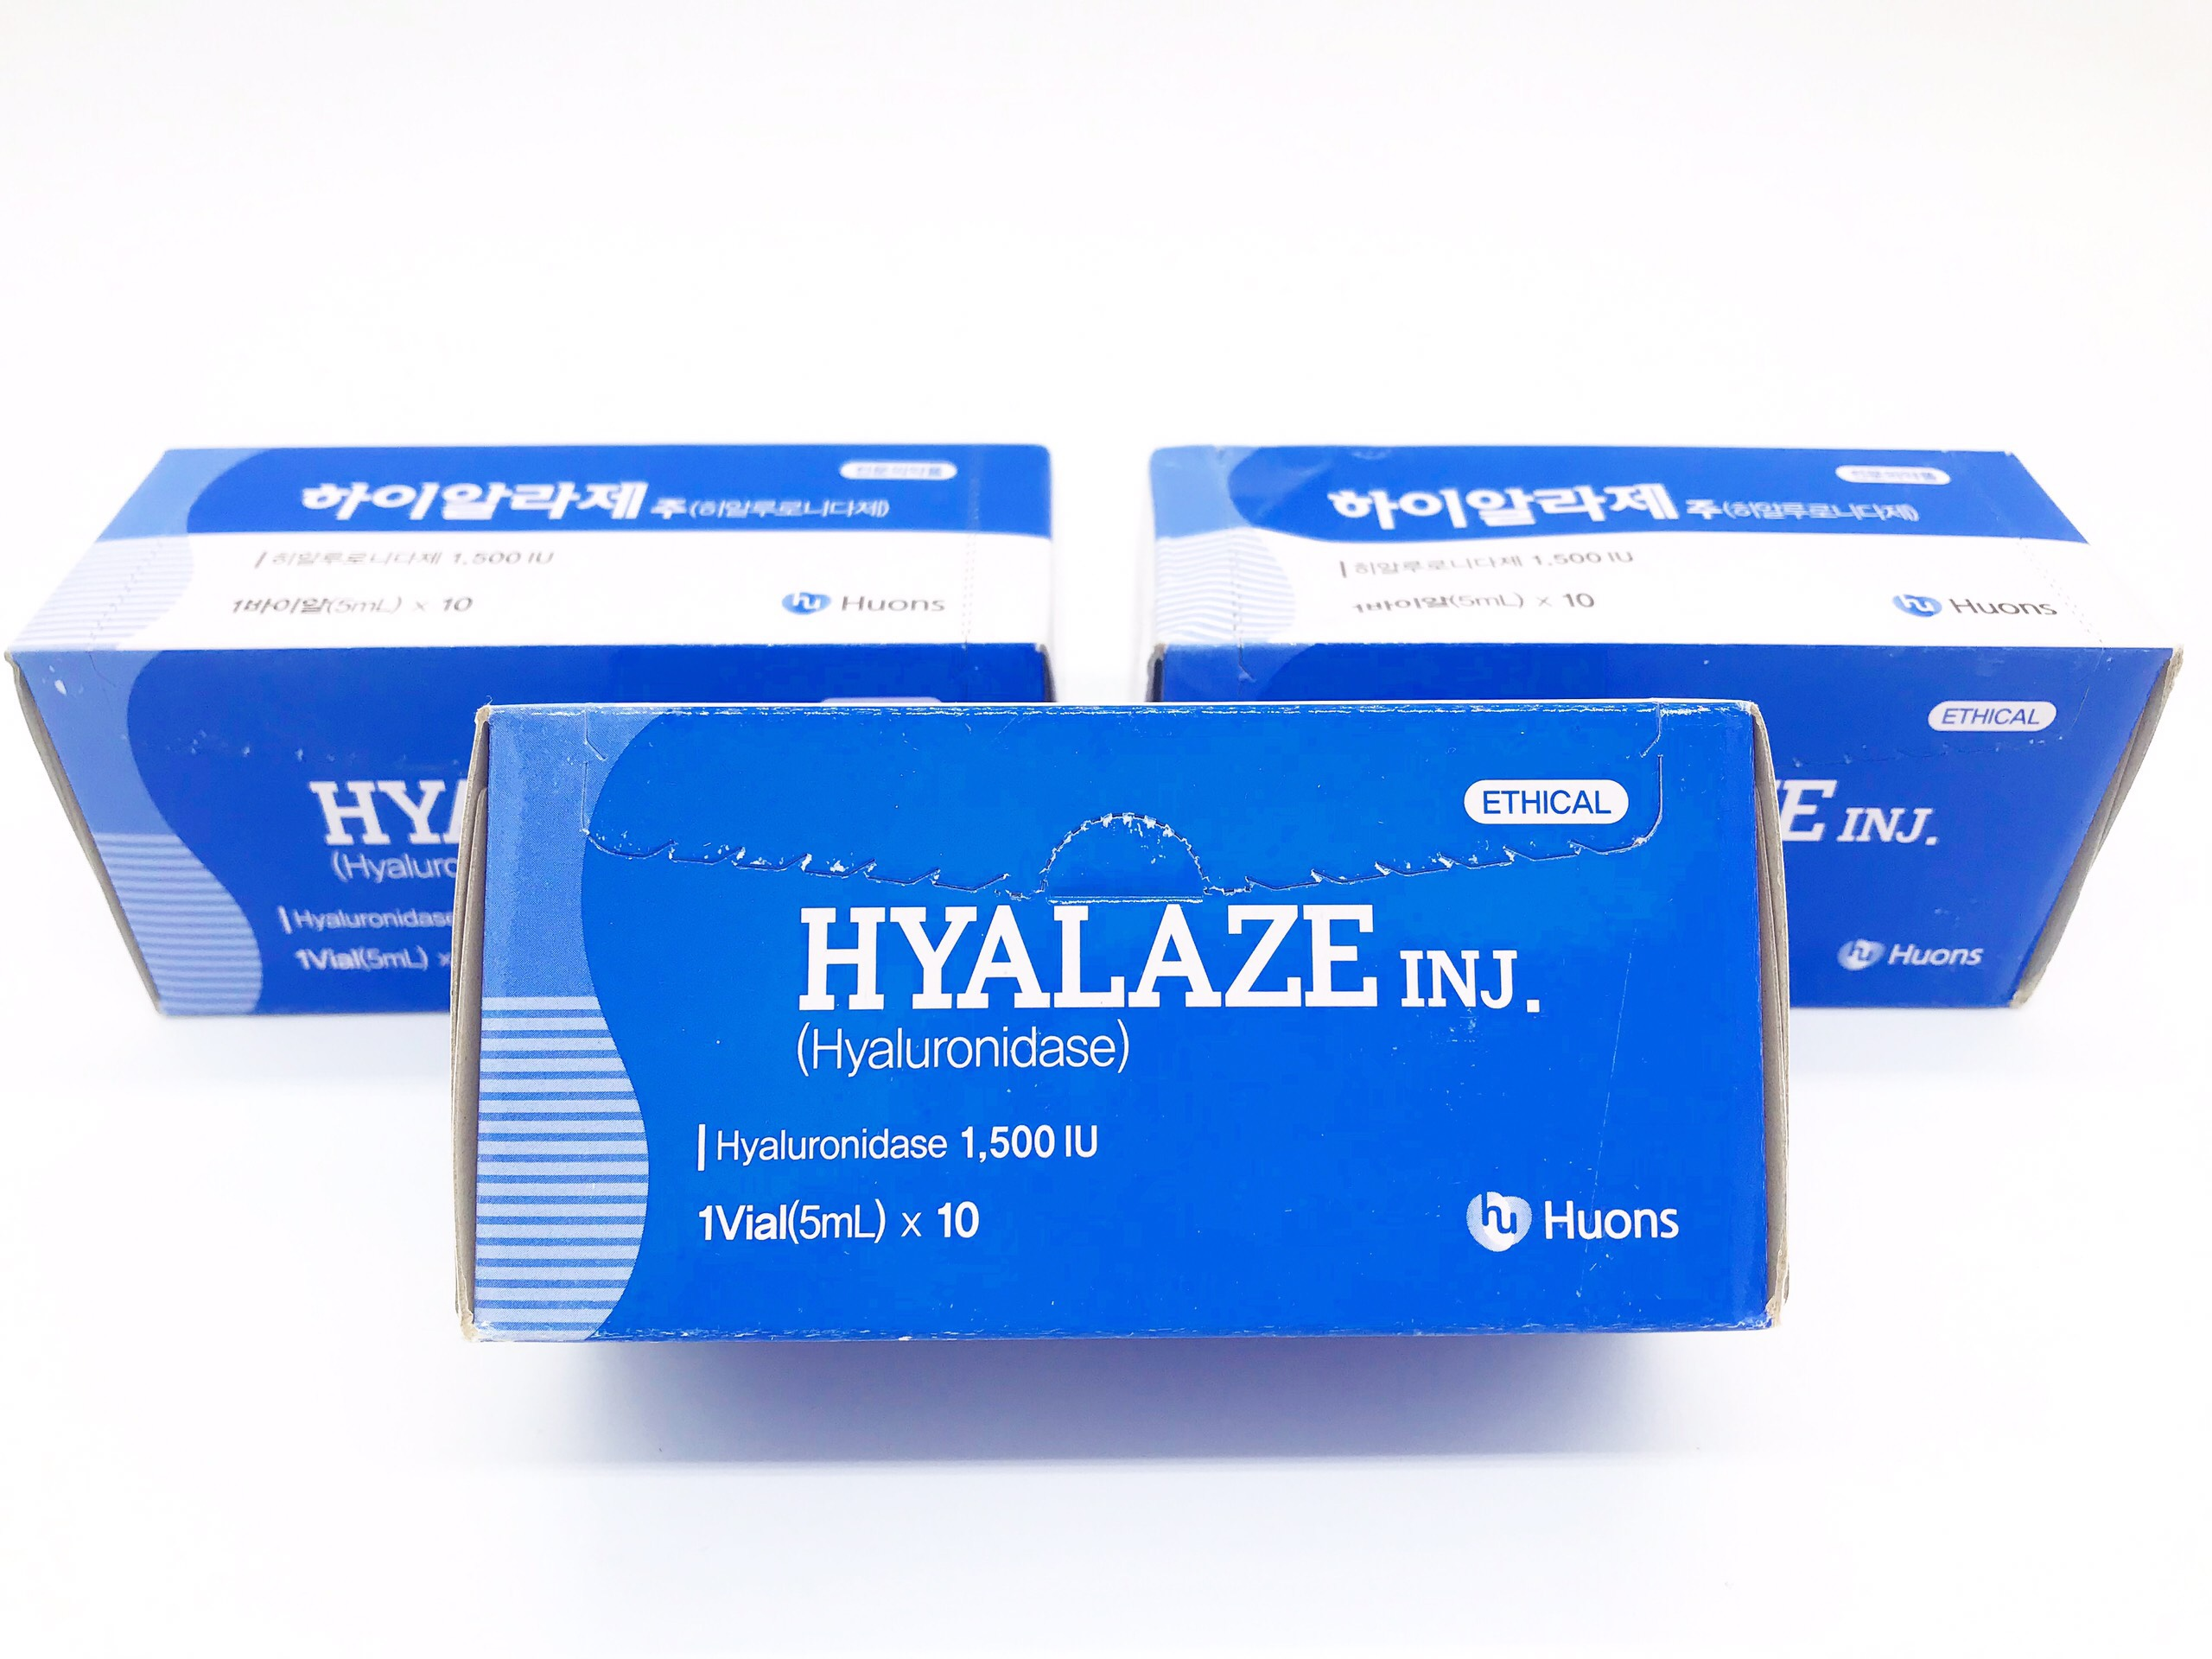 HYALAZE